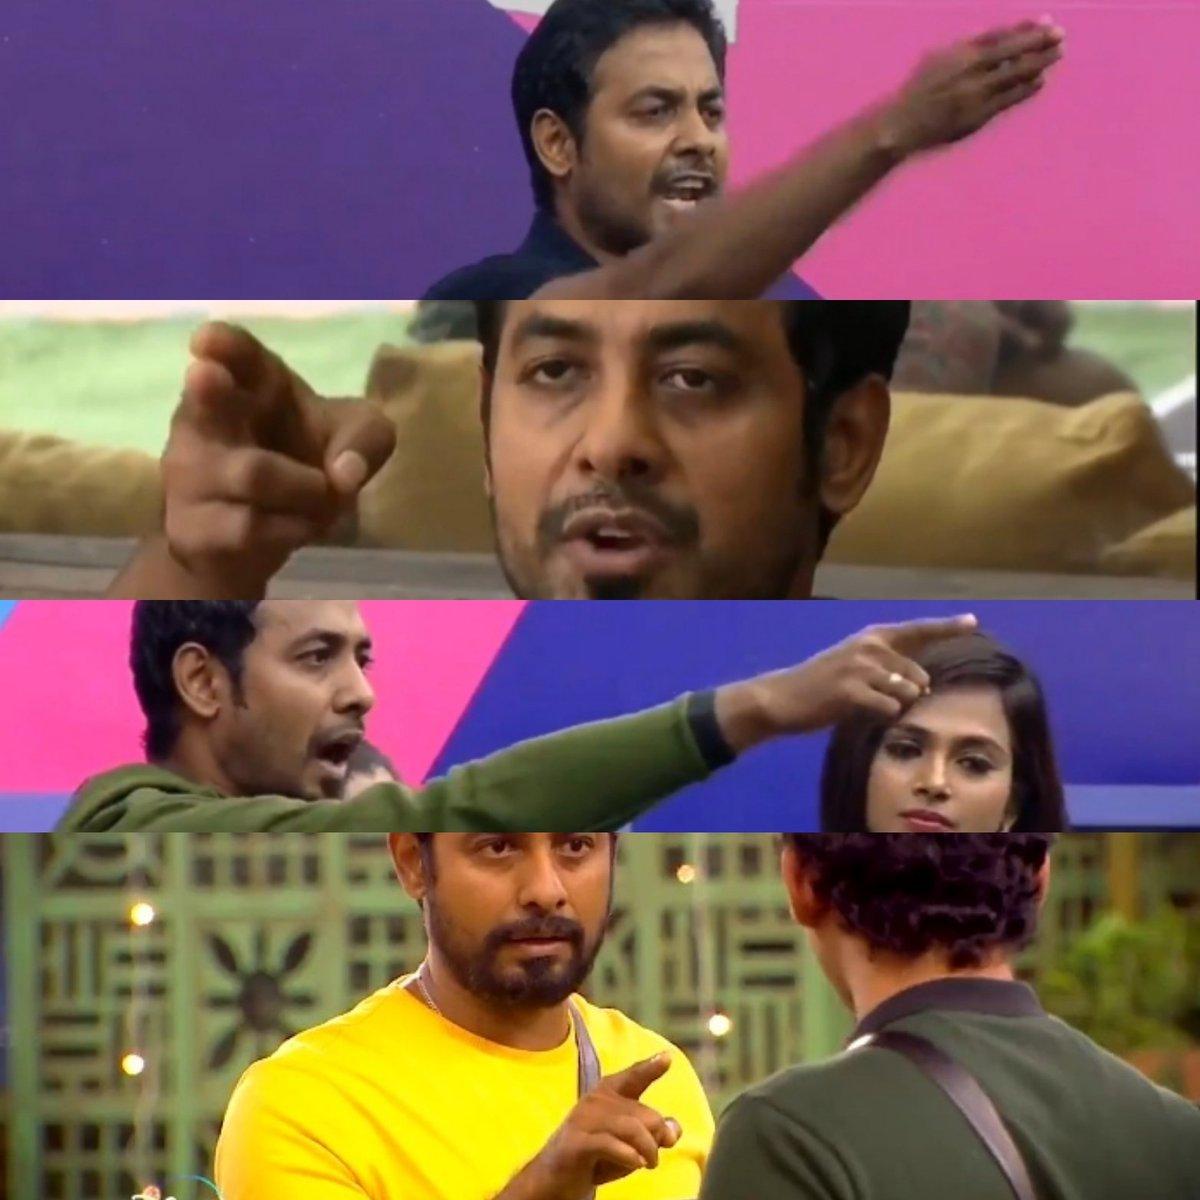 Ini vara pora #BiggBoss seasons la எவன் vena love 💘 nd comedy track la famous aagalam...  Aana mass nu 🔥 eduthu kitta adhu enga #Aari annan 🔥💥mattum dhan..🤫  #AariArjunan #AariArmy